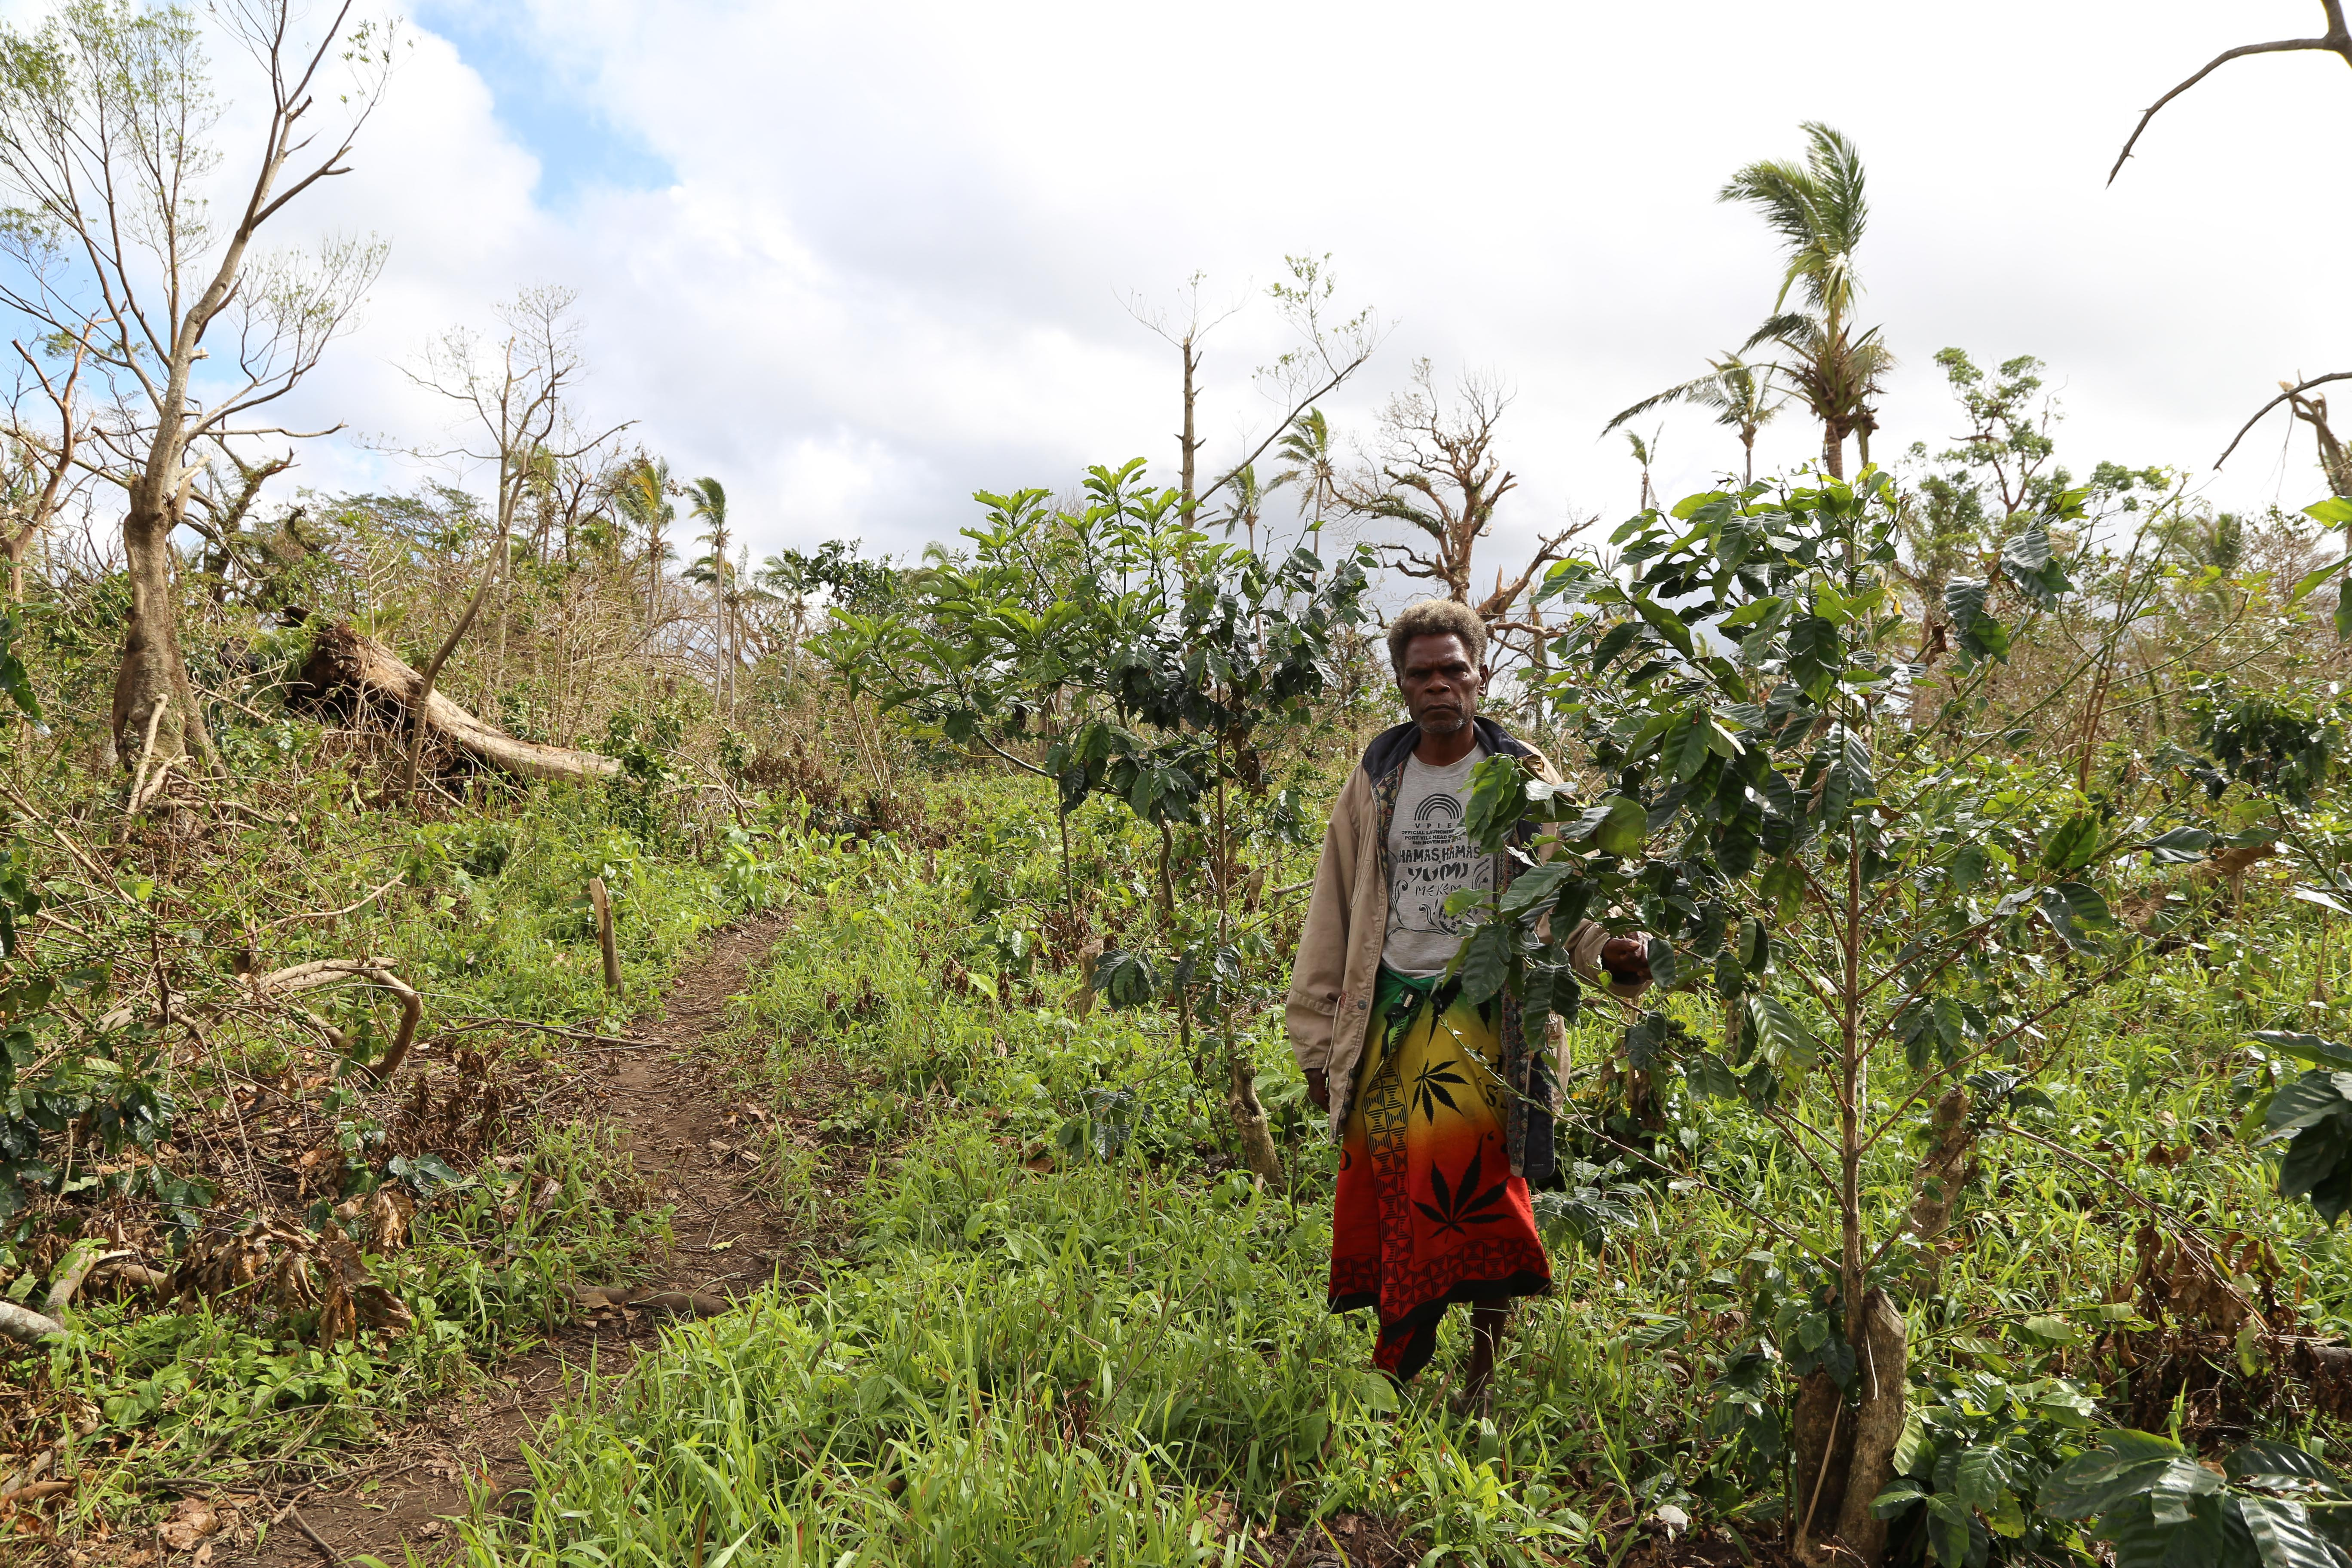 Jacob Tallah surveys the few coffee plants he has left